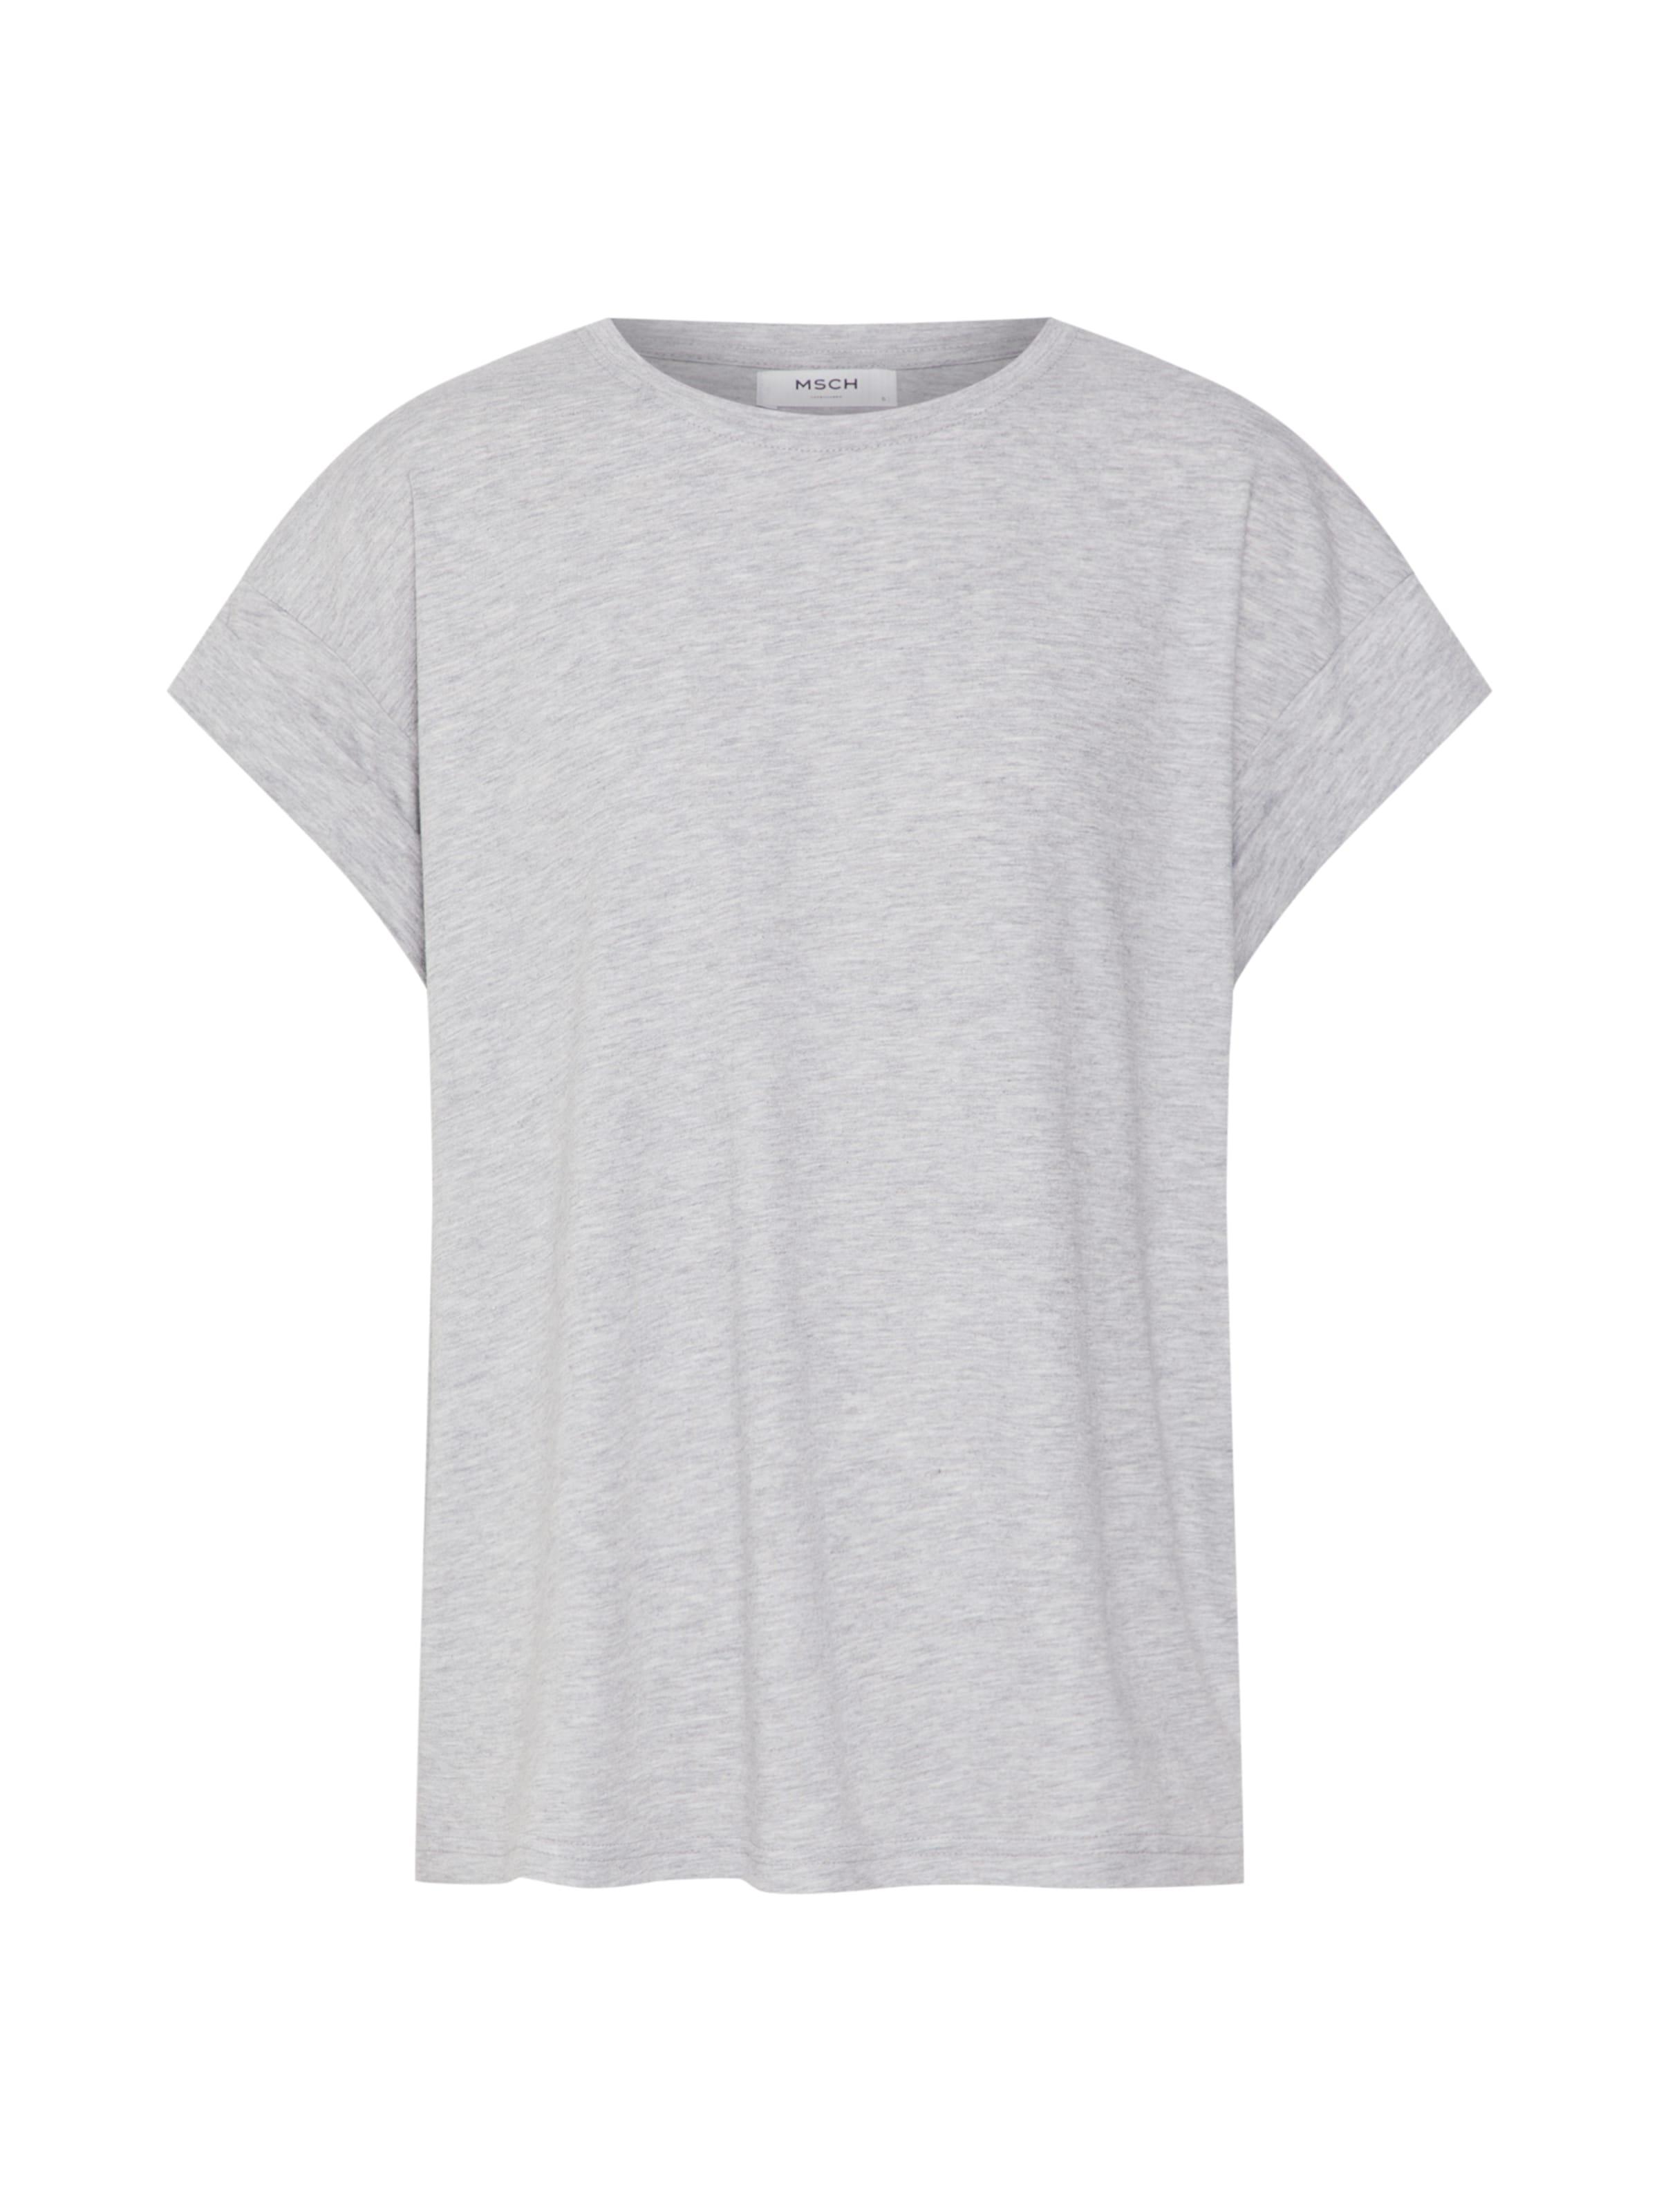 Copenhagen In Std' T Moss 'alva shirt Grau srCtQdhx